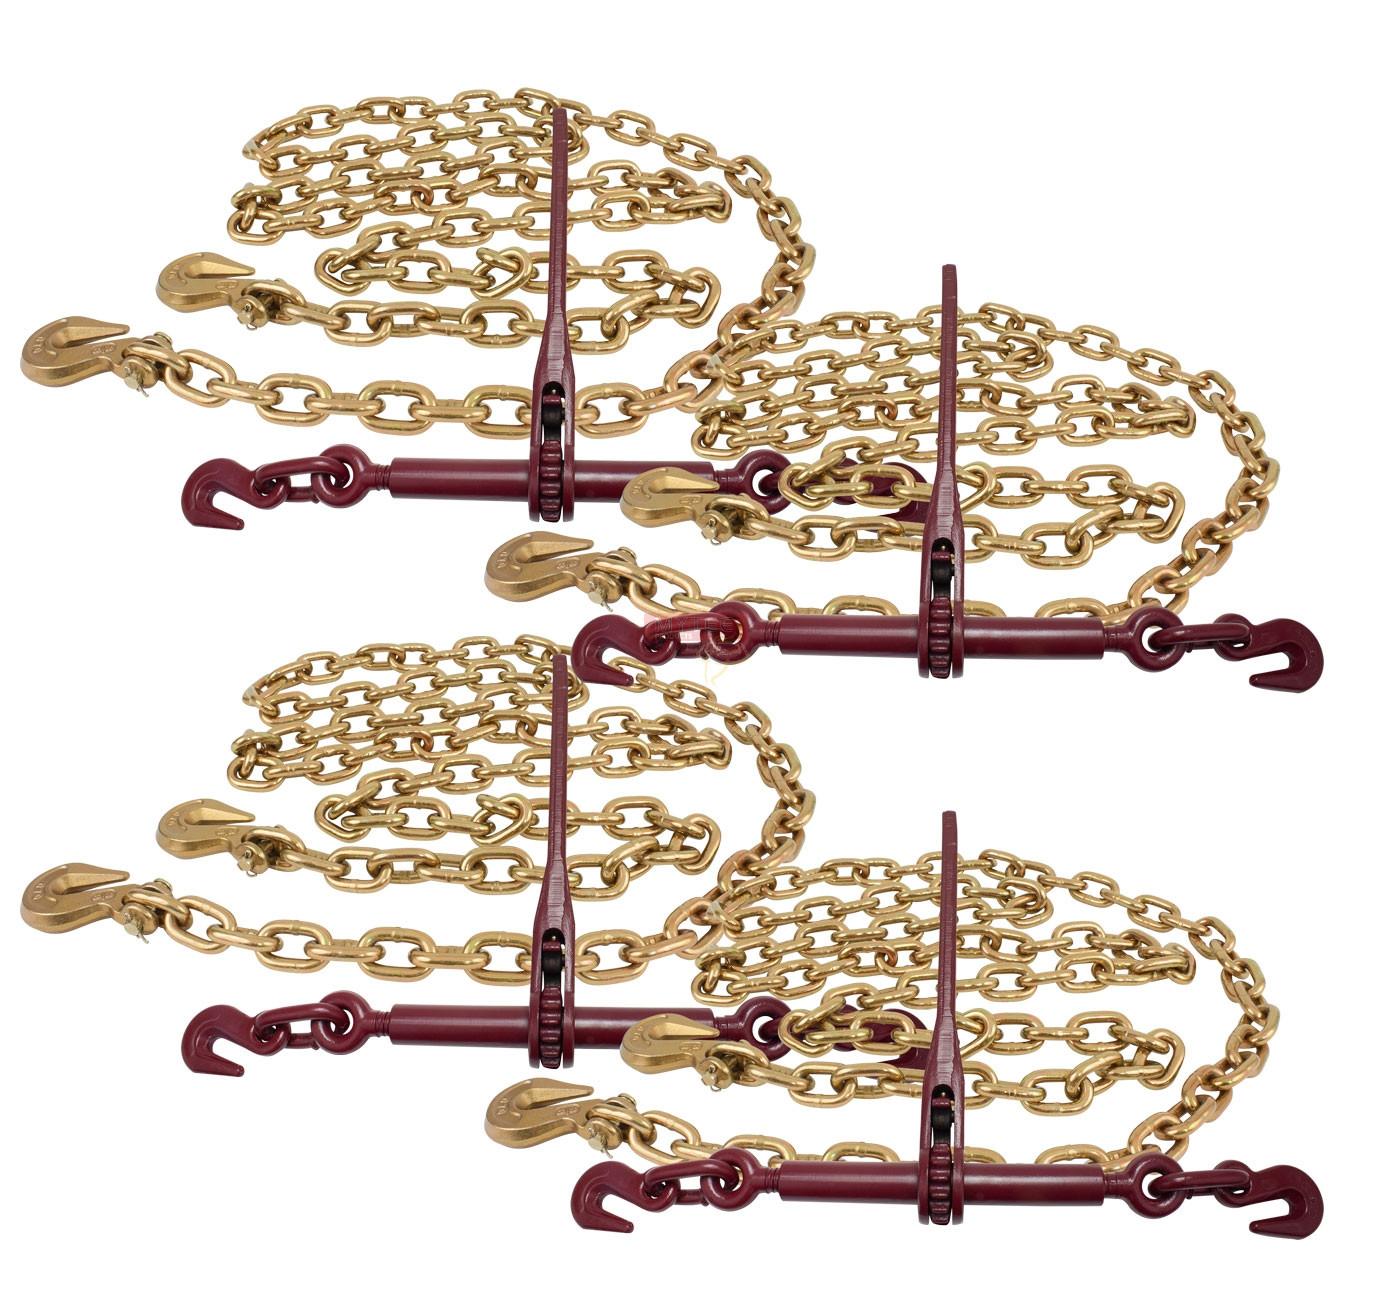 3/8 12' G70 Chain (4) And Ratchet Binder Boomer (4